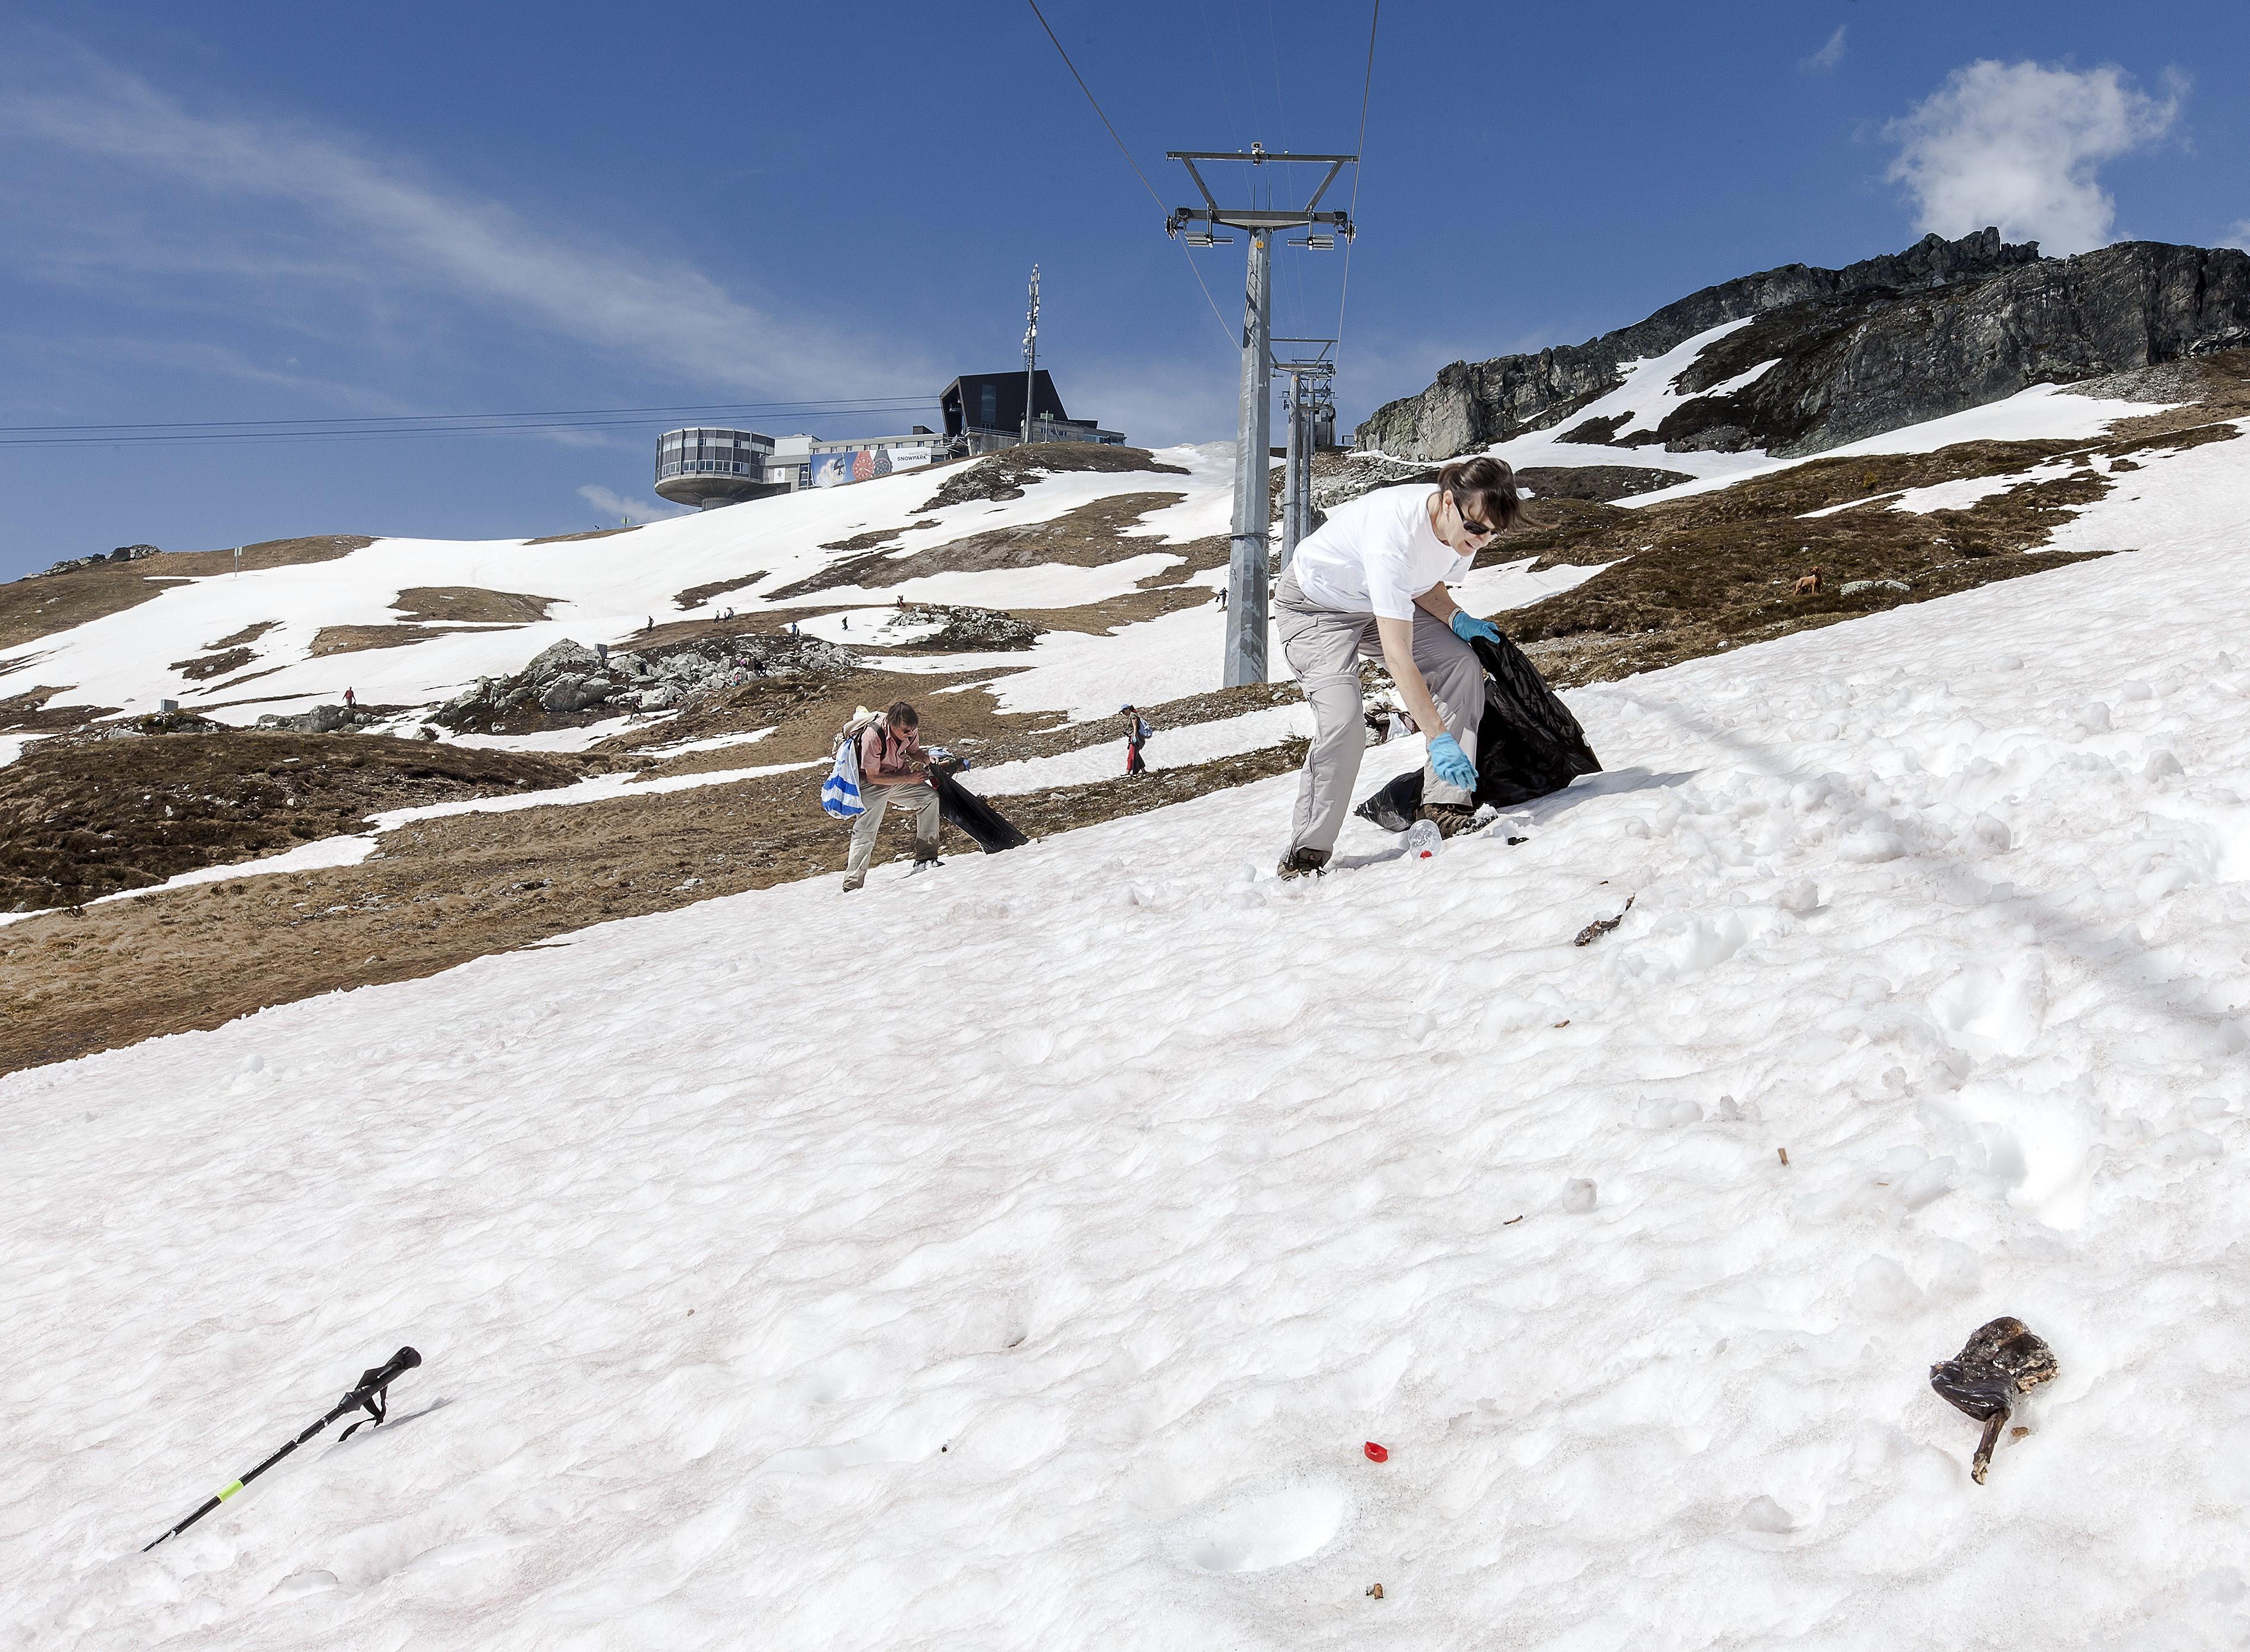 Clean up day Plaun, © Bergbahnen Graubünden, Thomas Hablützel